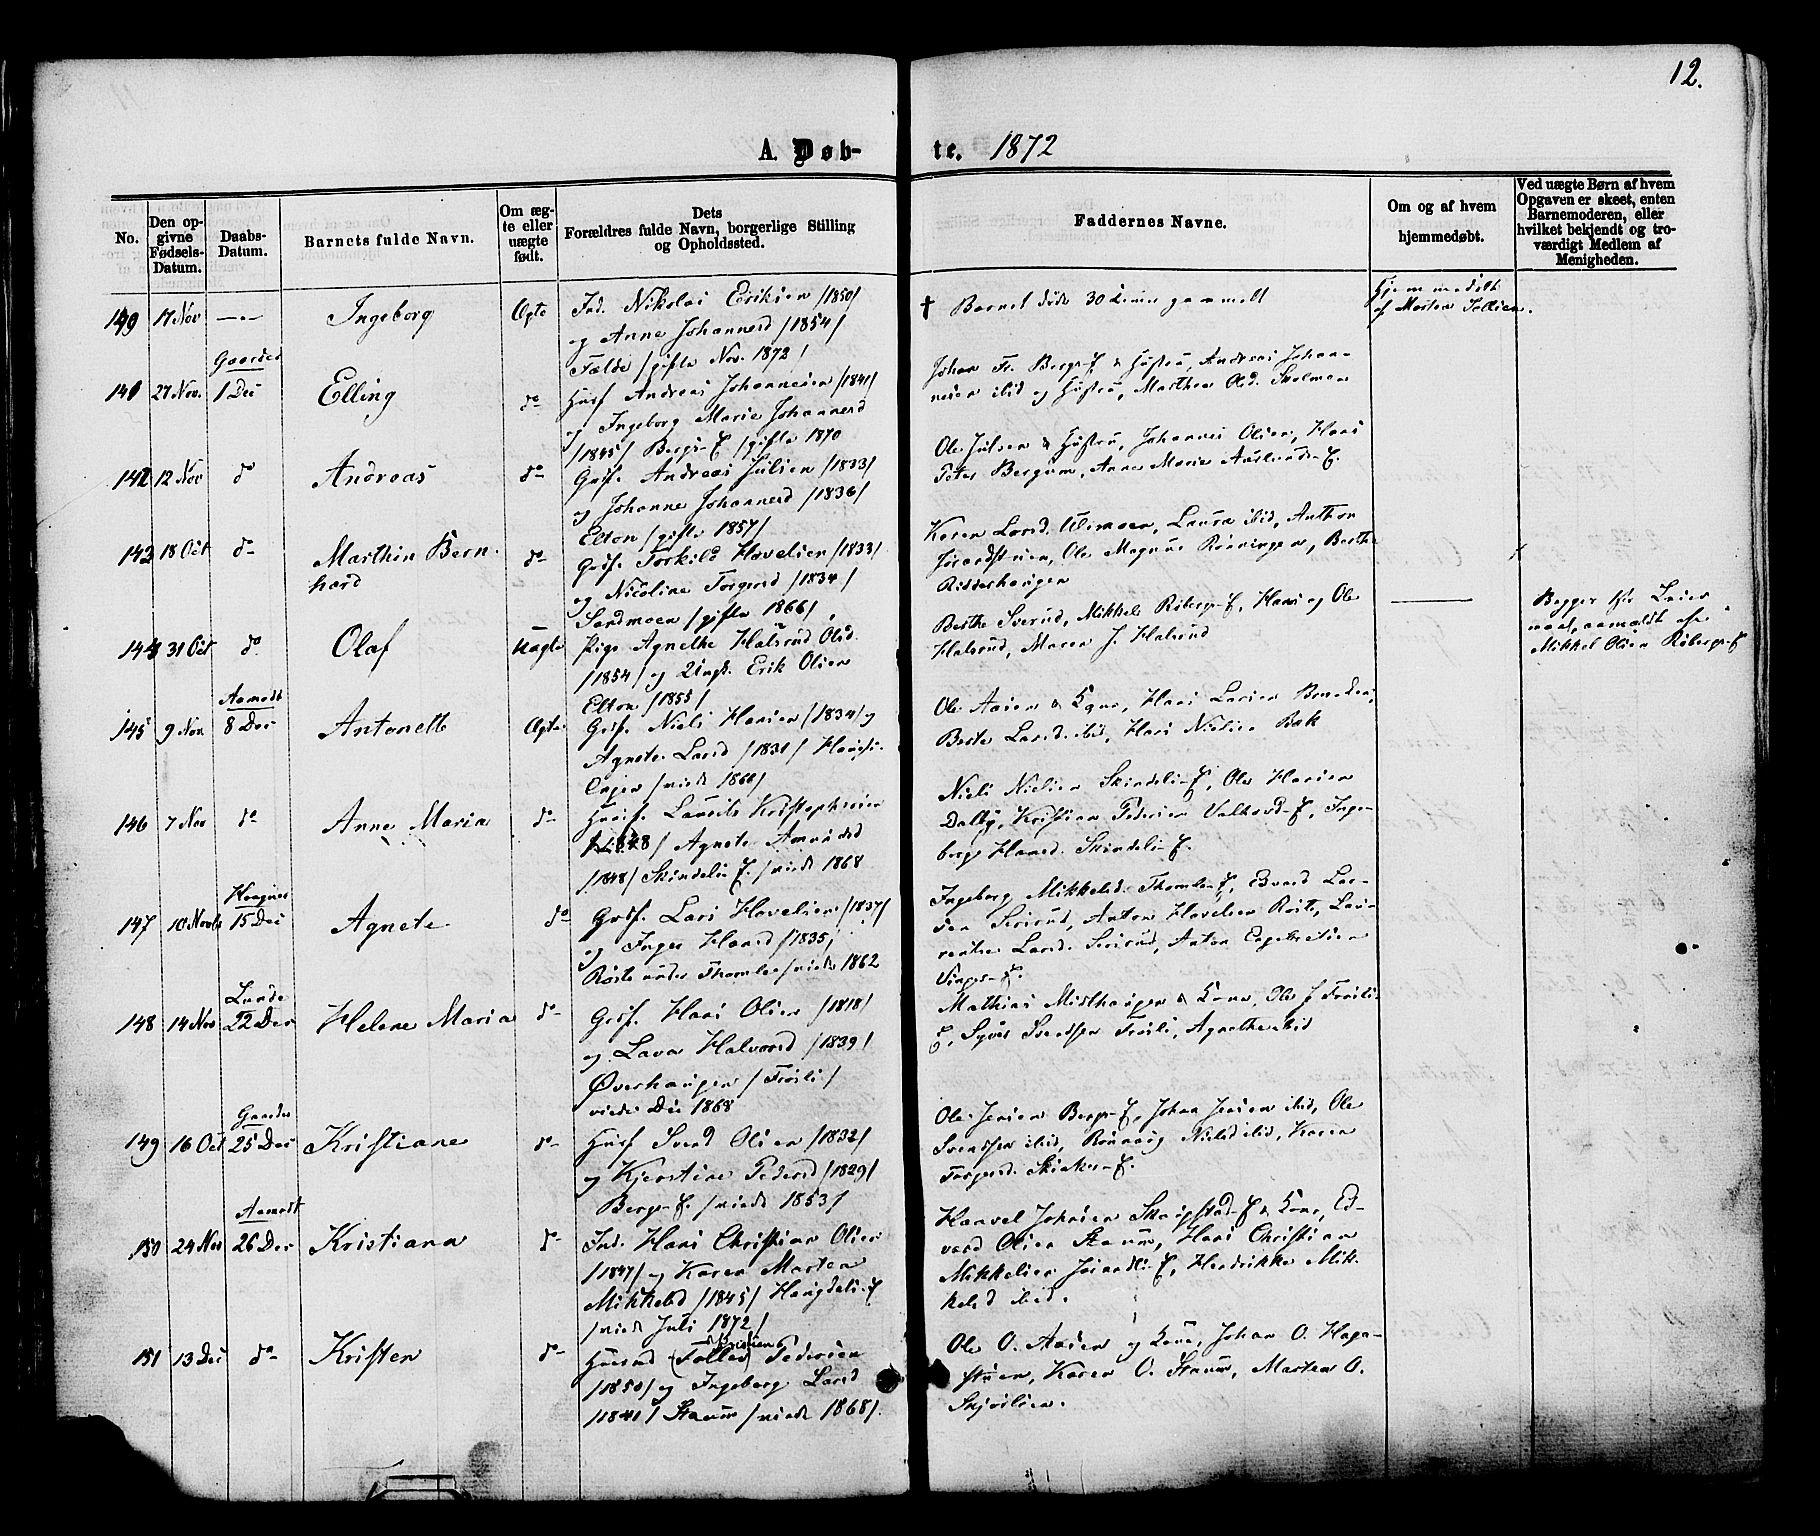 SAH, Nordre Land prestekontor, Ministerialbok nr. 2, 1872-1881, s. 12